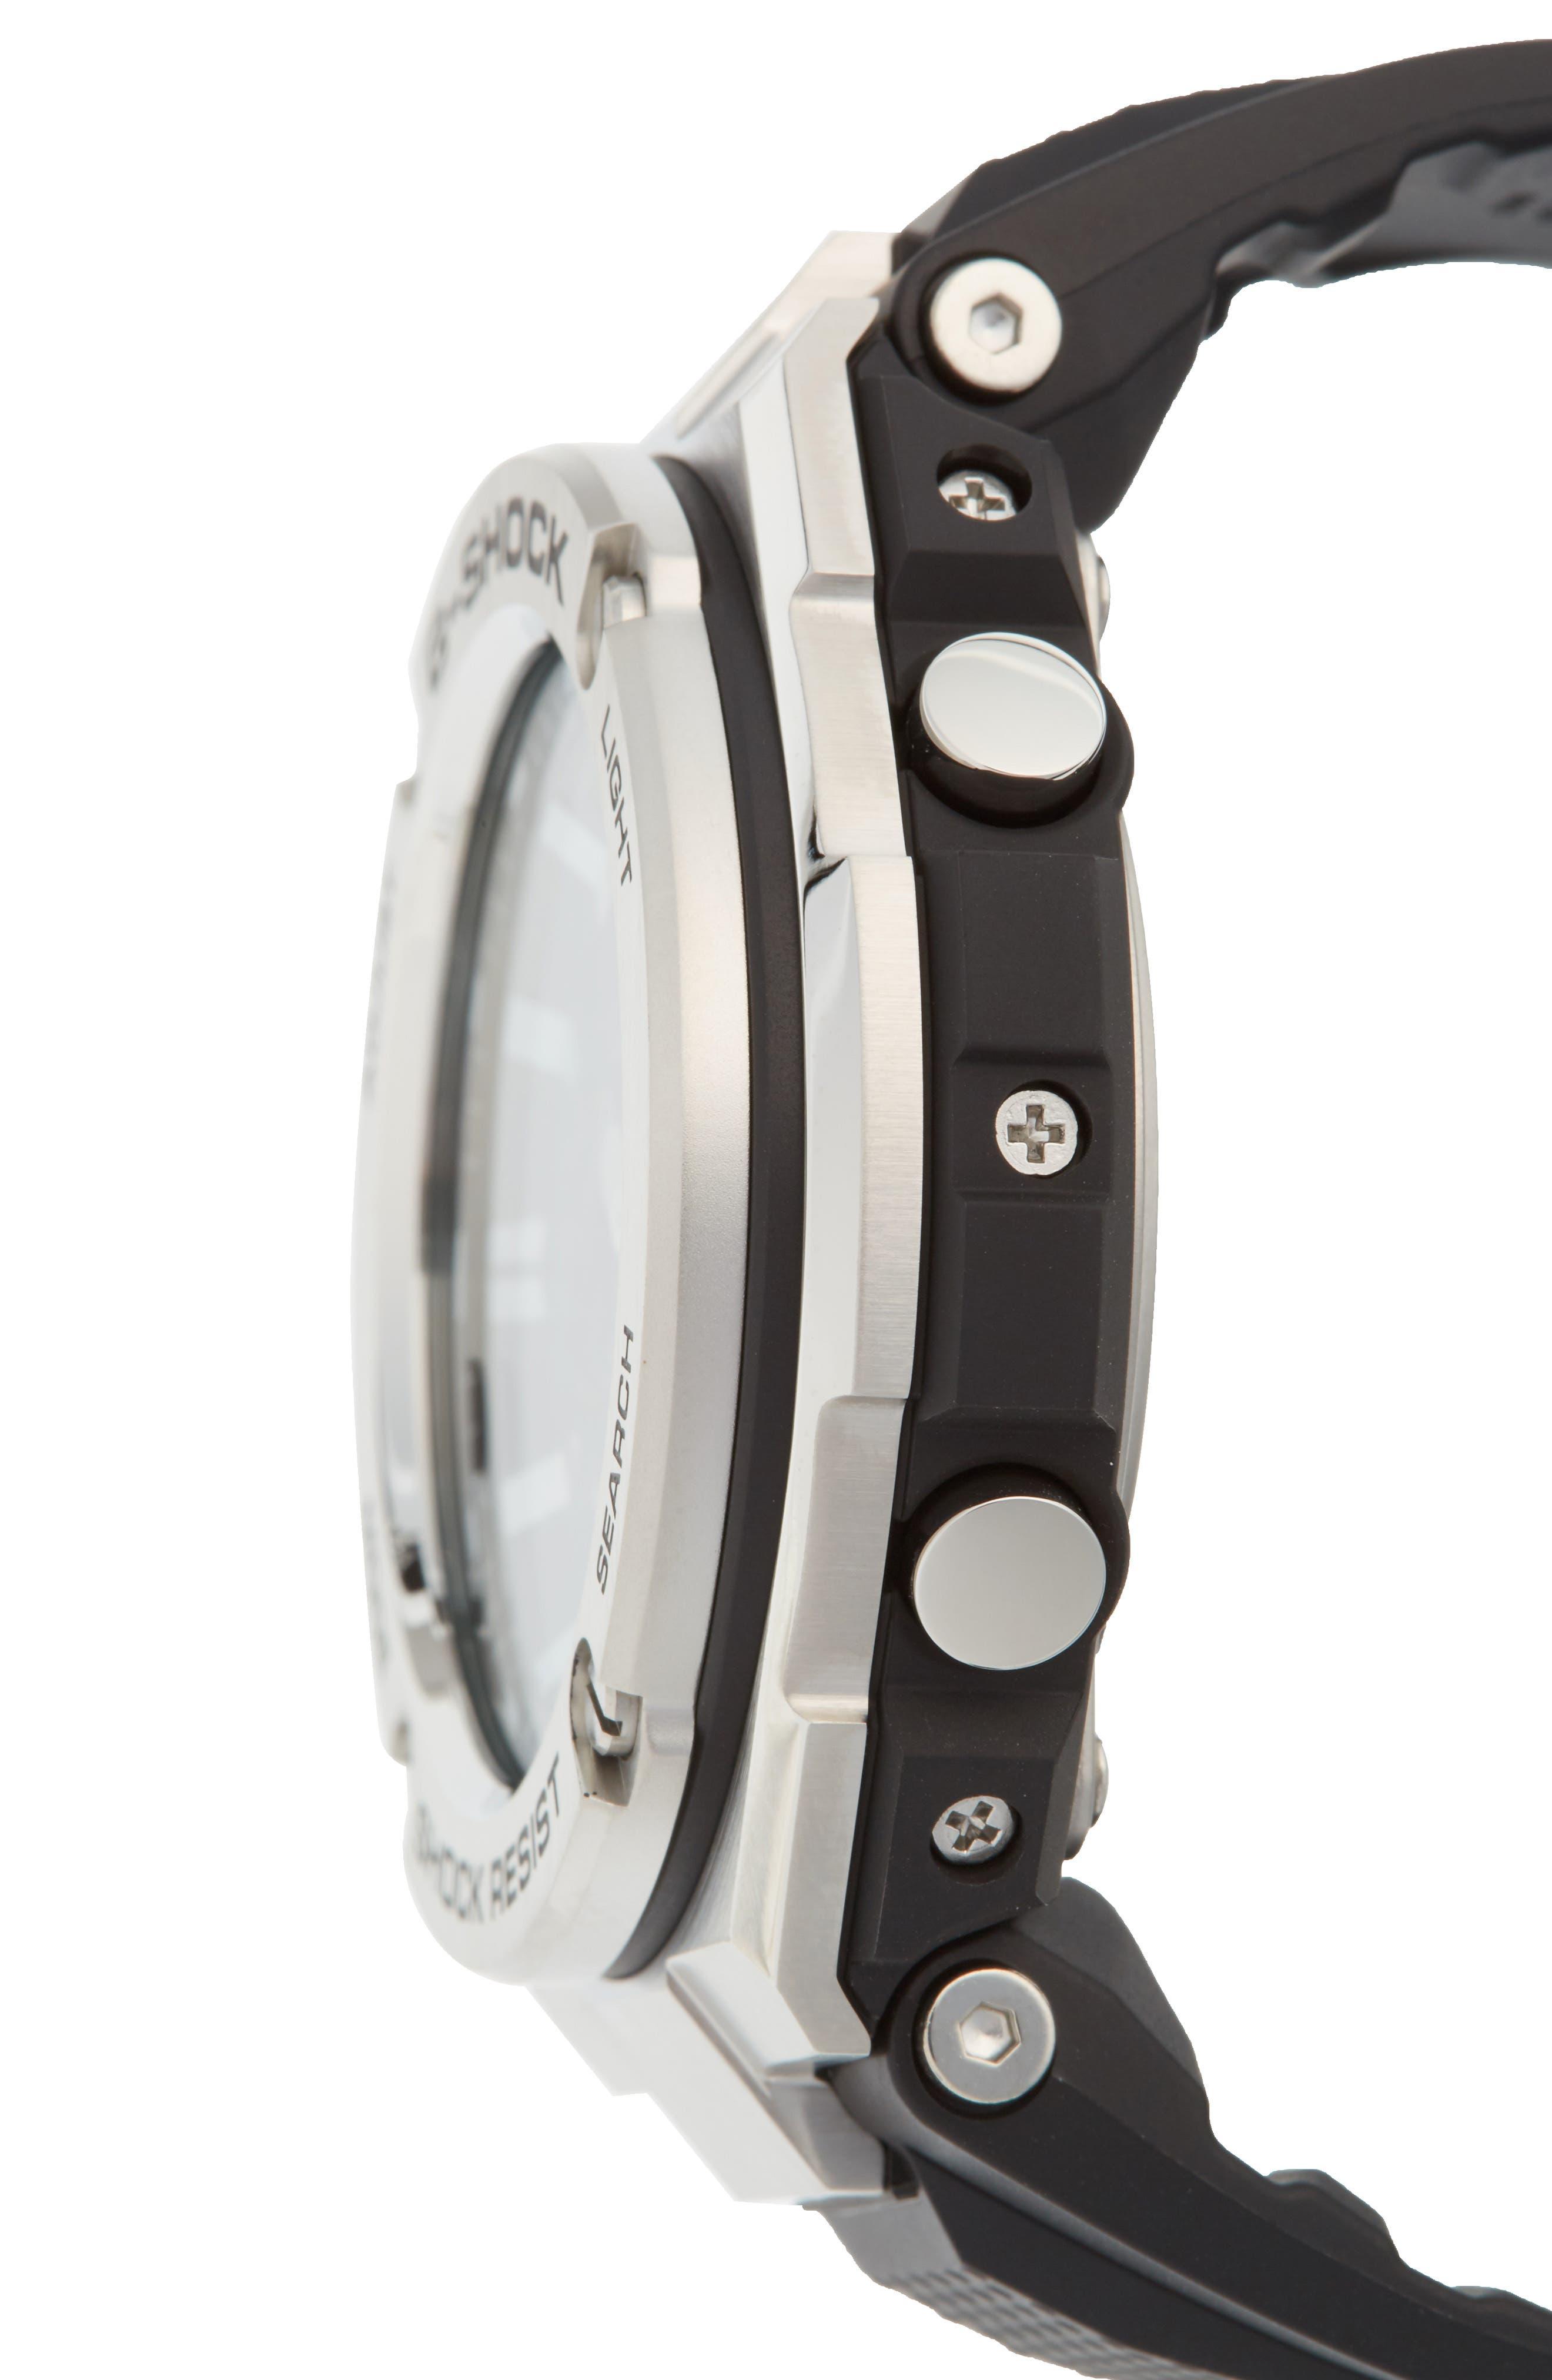 G-SHOCK BABY-G, G-Shock 'G-Steel' Ana-Digi Resin Strap Watch, 59mm x 52mm, Alternate thumbnail 3, color, BLACK